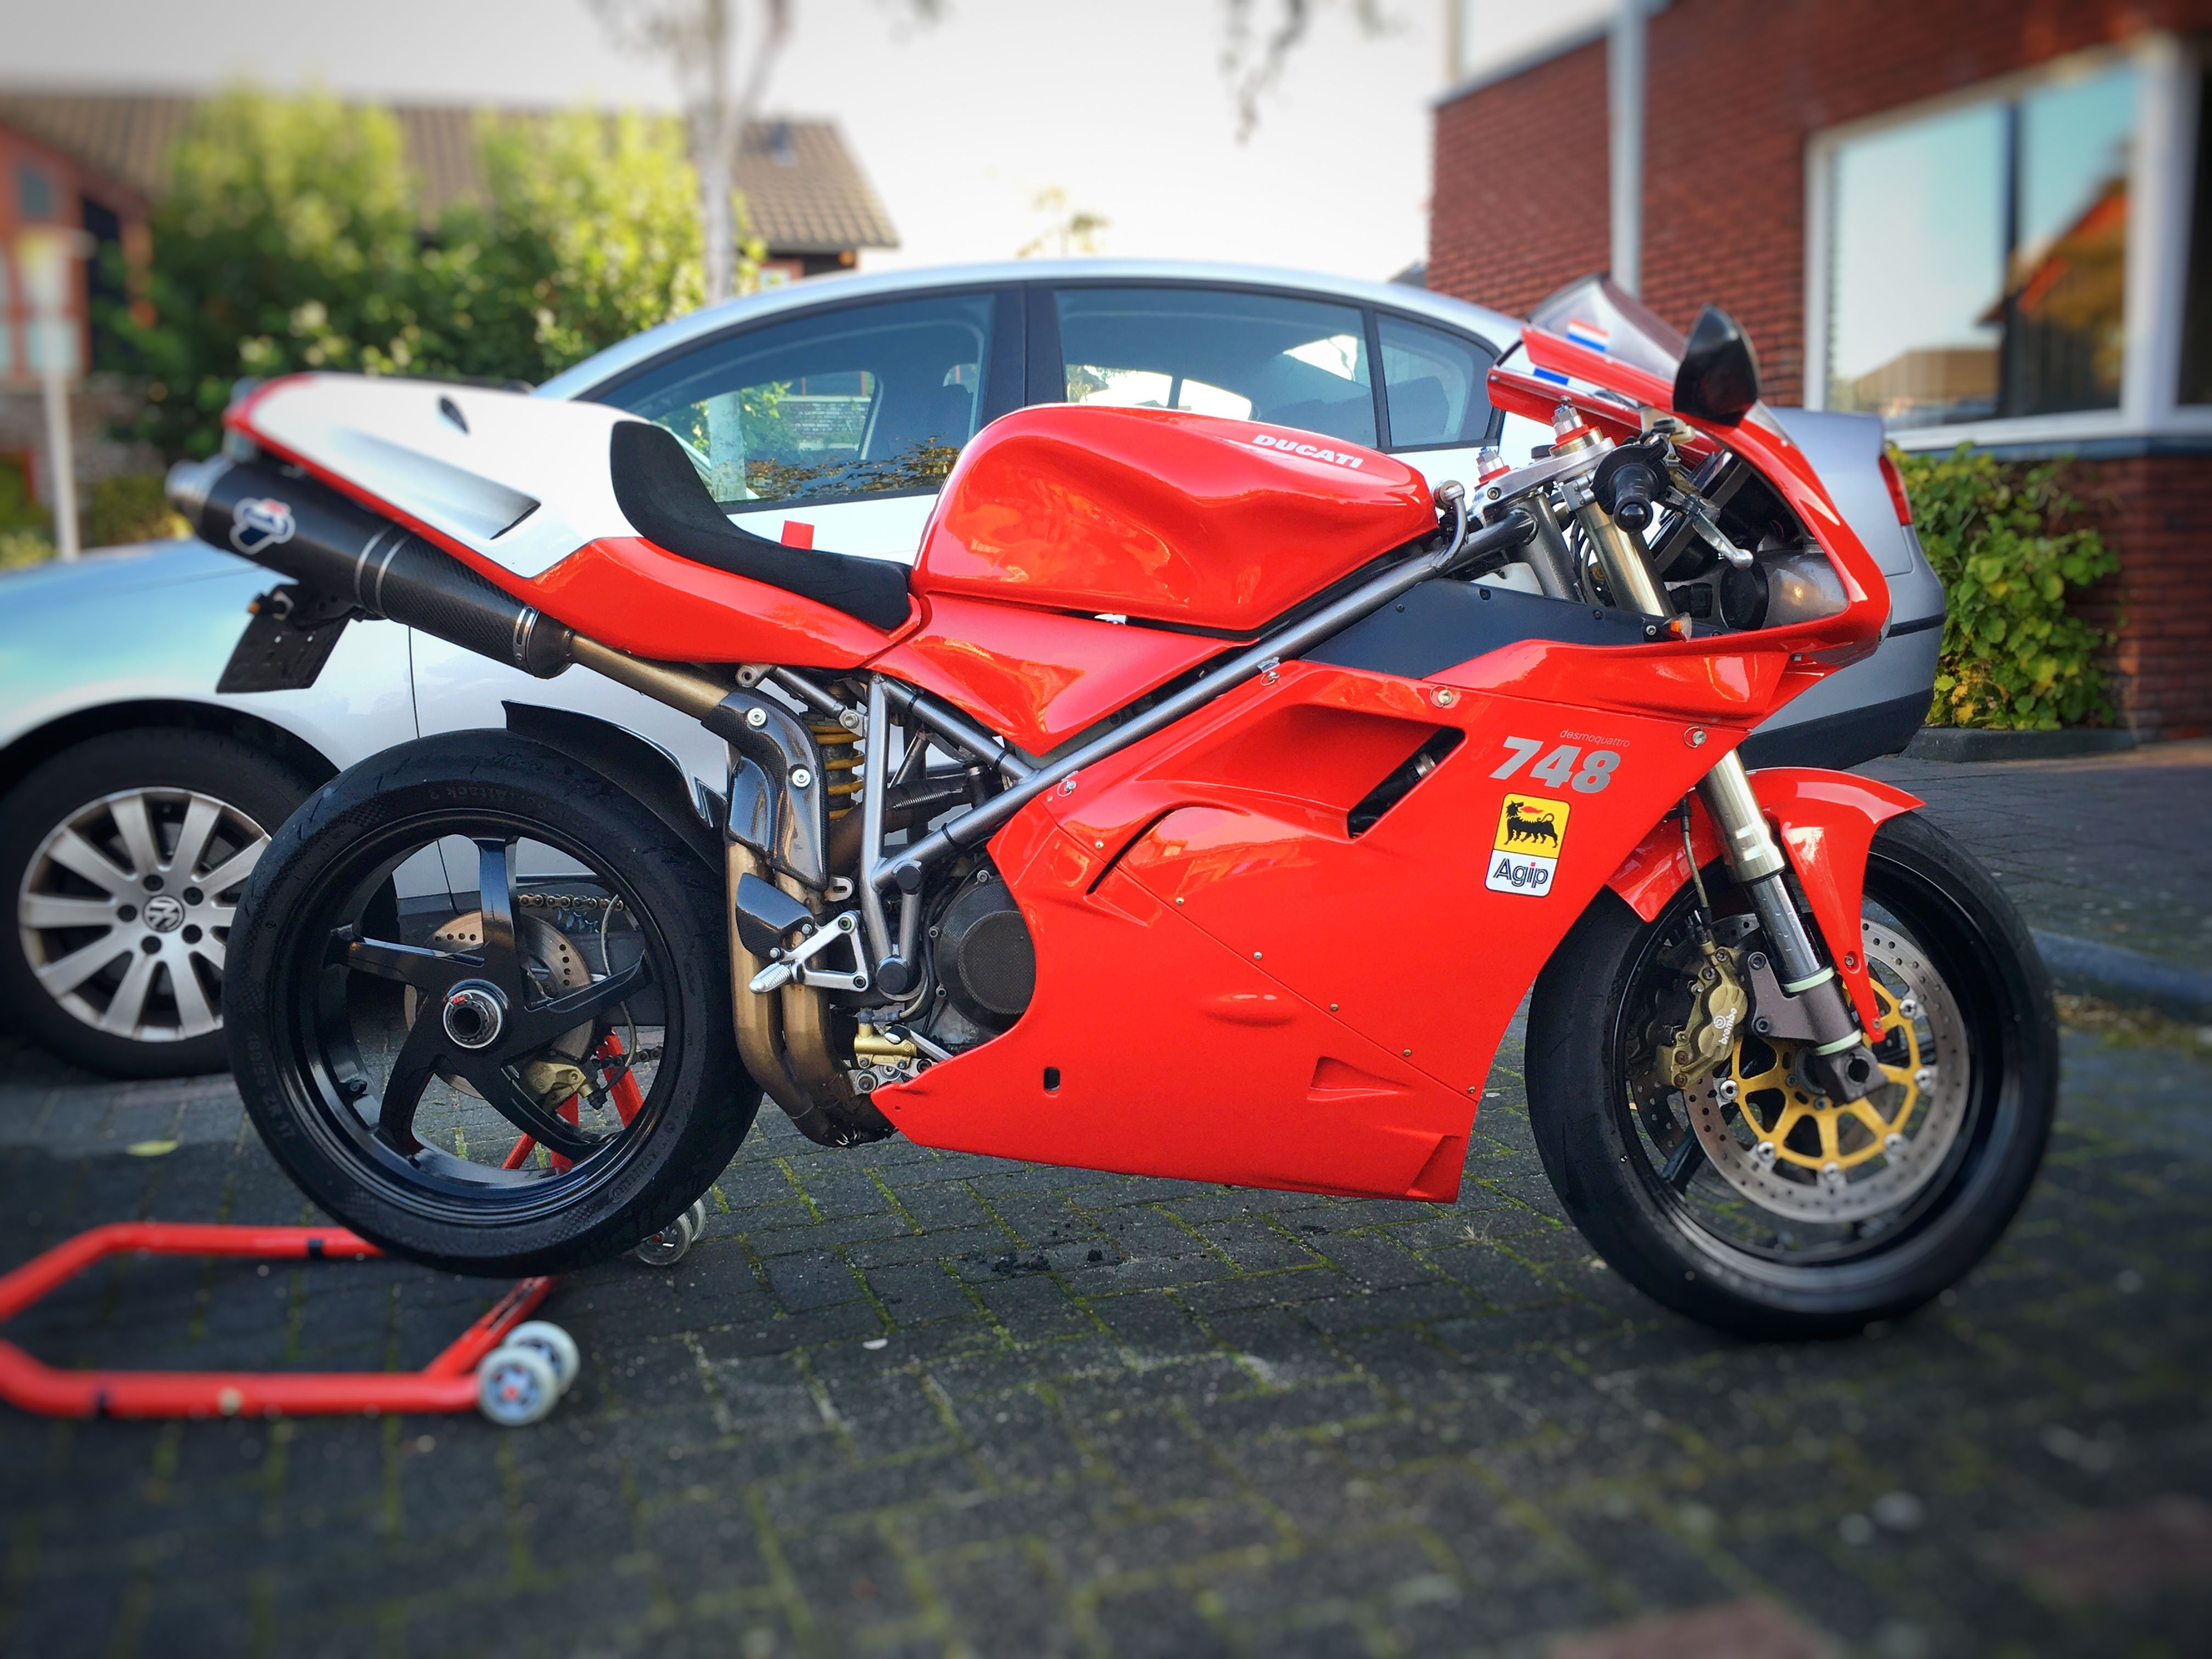 Ducati748s Ducati Superbike Ducati 748 Ducati